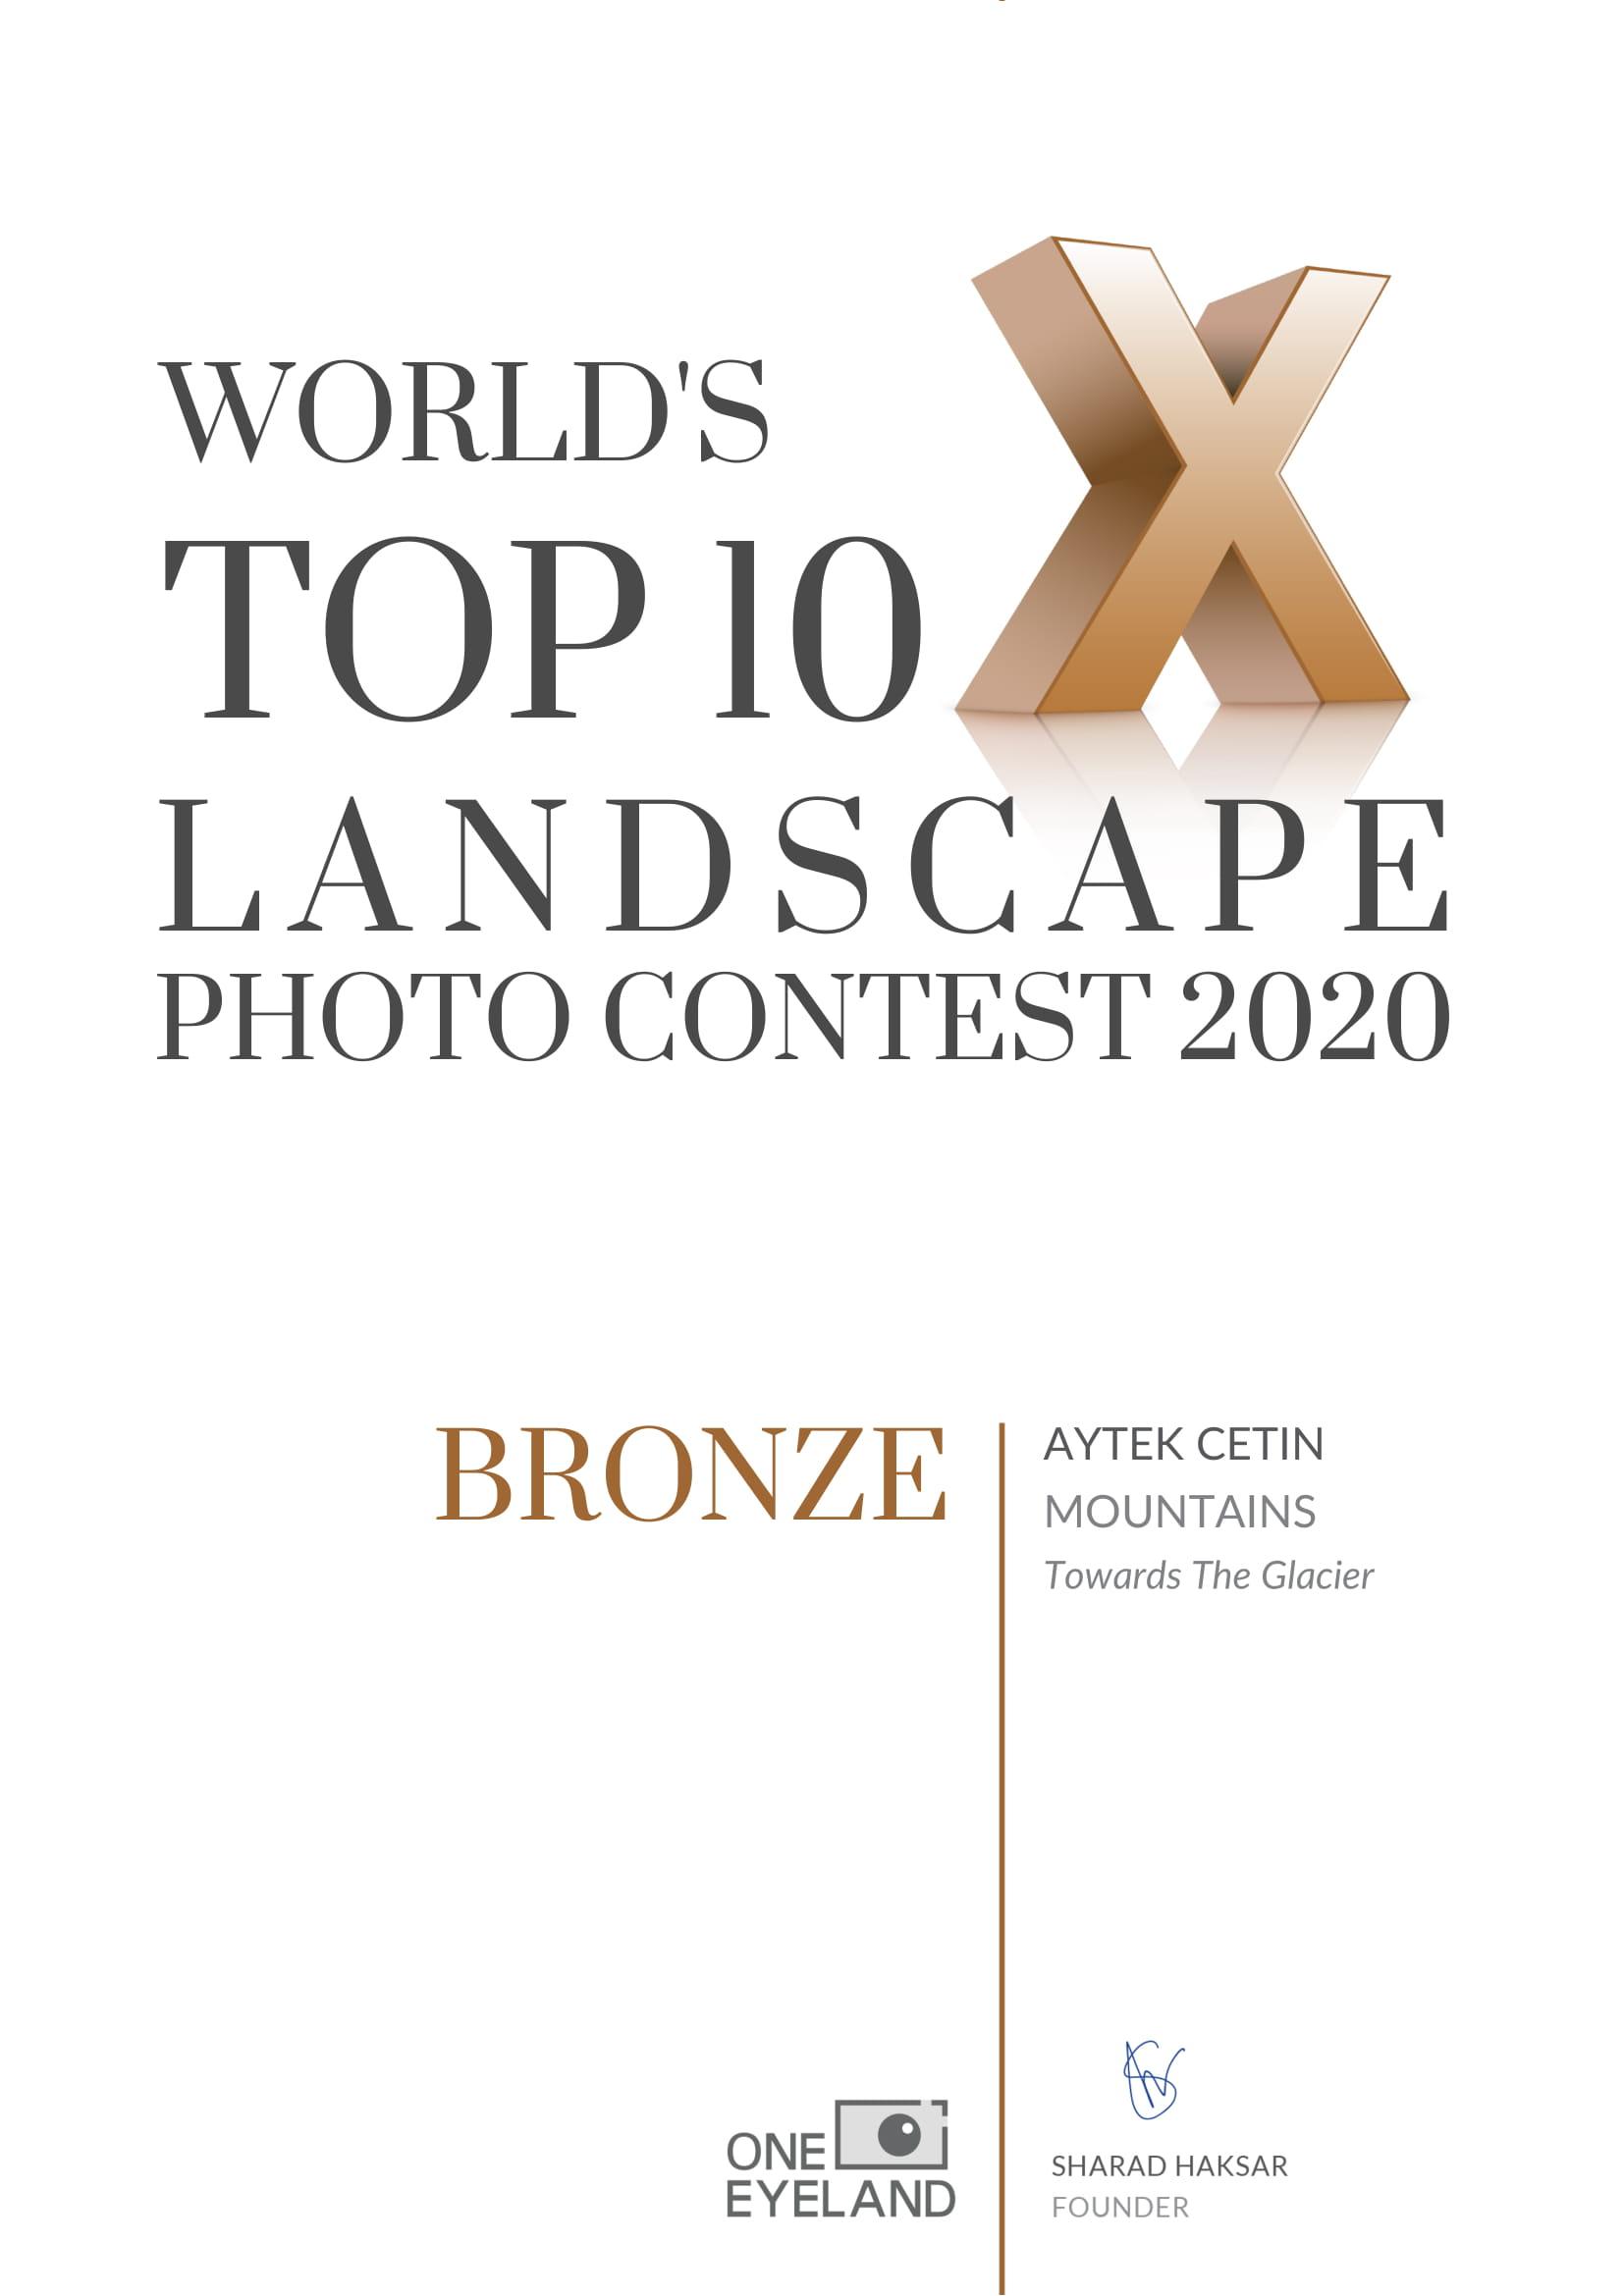 aytek-cetin-bronze-landscape-mountains-2020-1